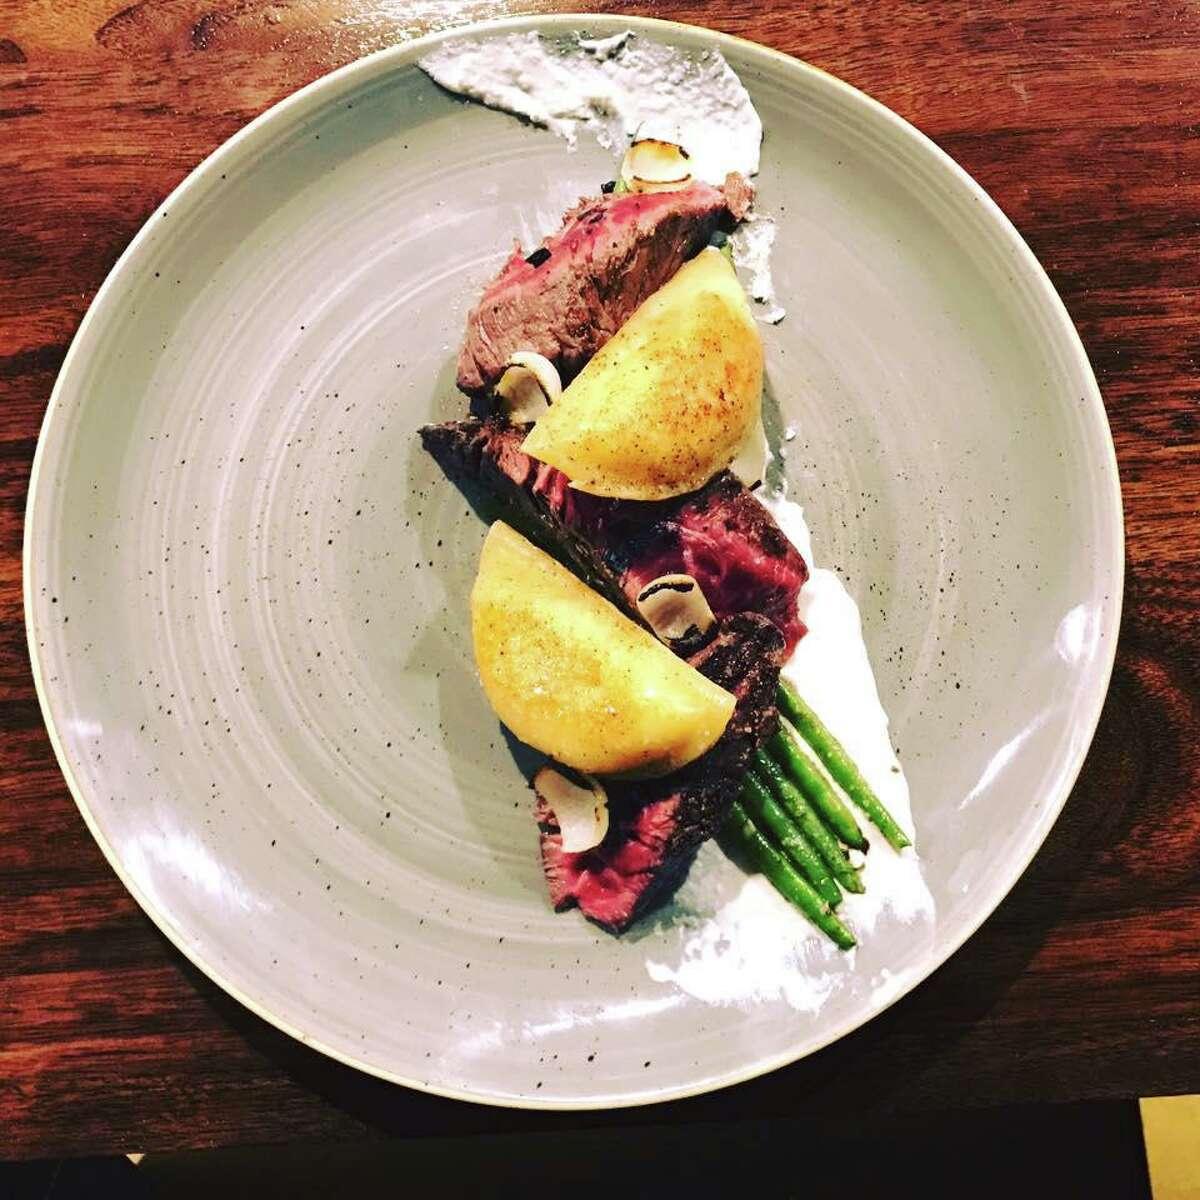 Hanger steak with potato and cheddar pierogi, green beans and horseradish cream at Riel restaurant.